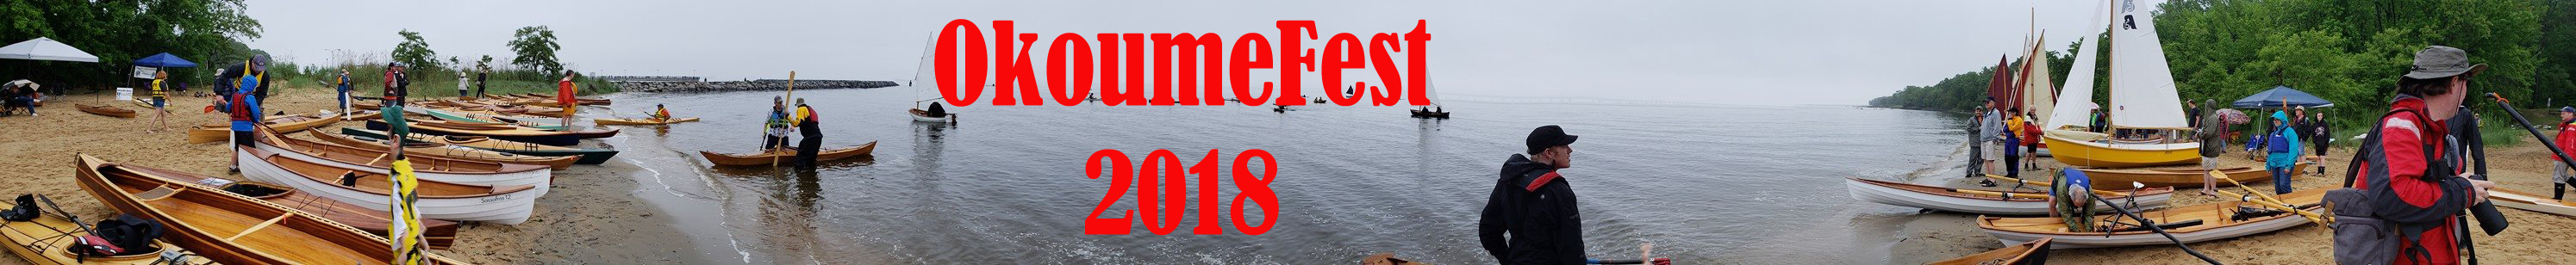 OkoumeFest 2018